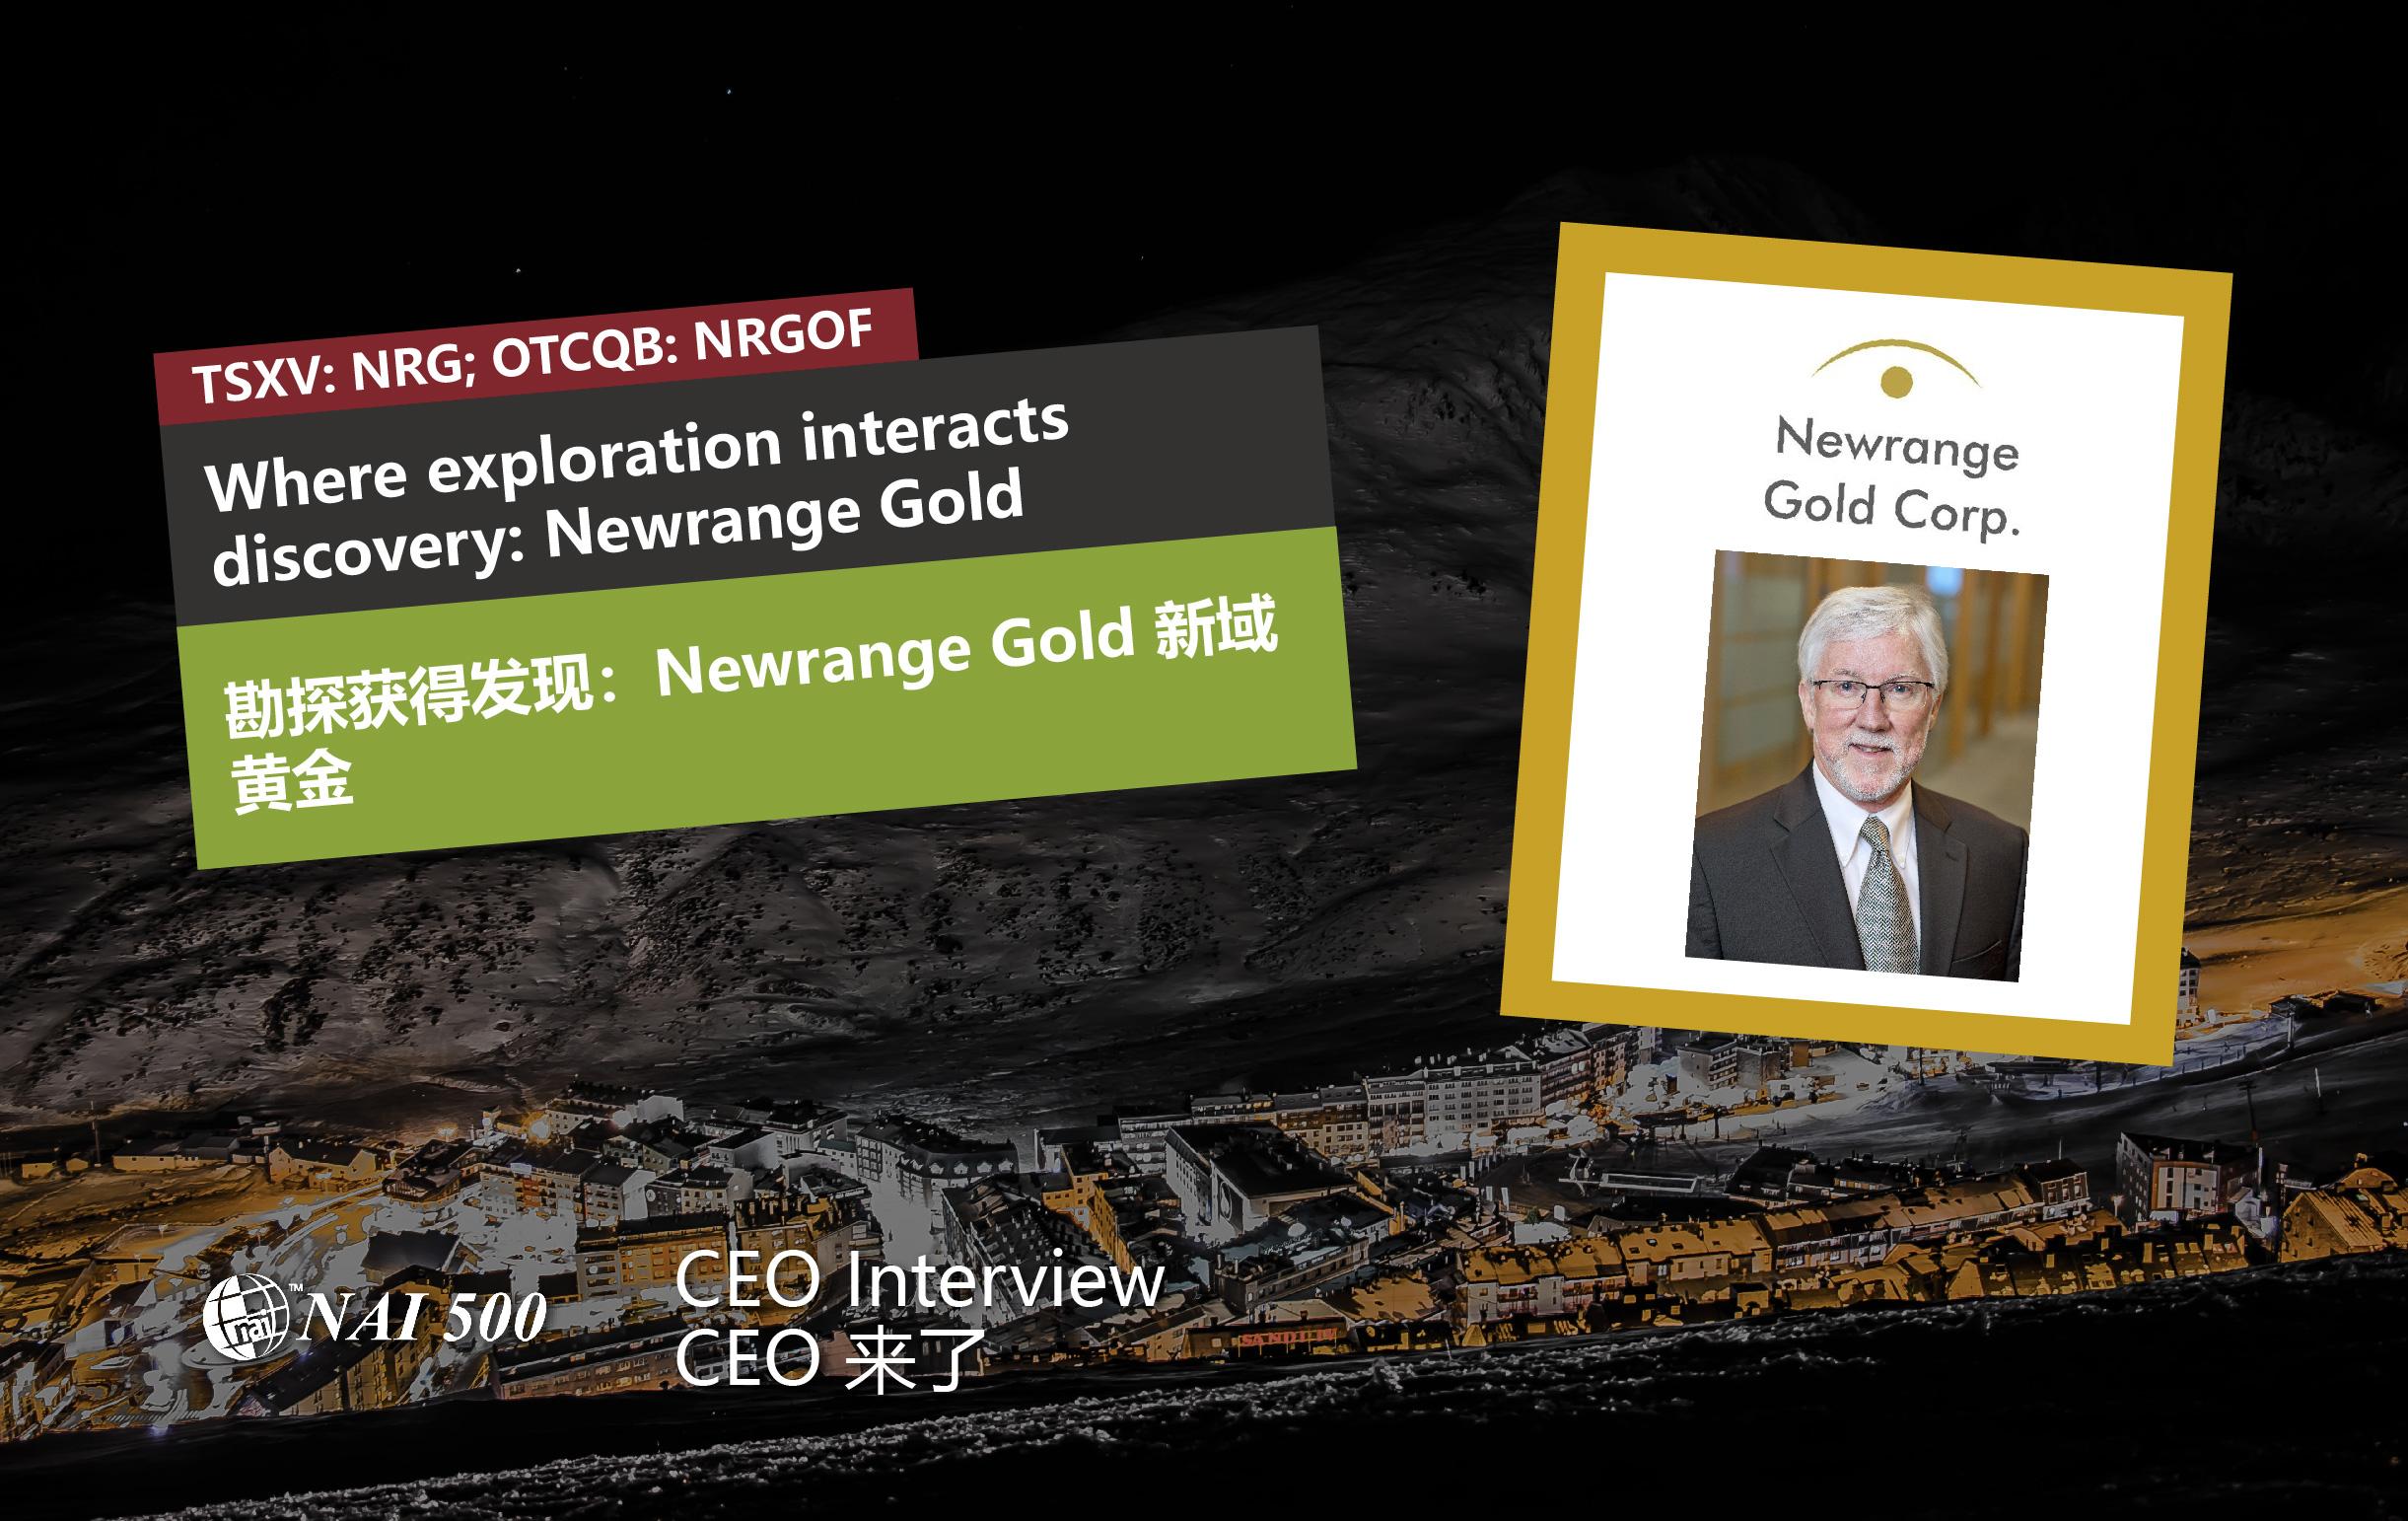 Where exploration interacts discovery: Newrange Gold (TSXV: NRG)